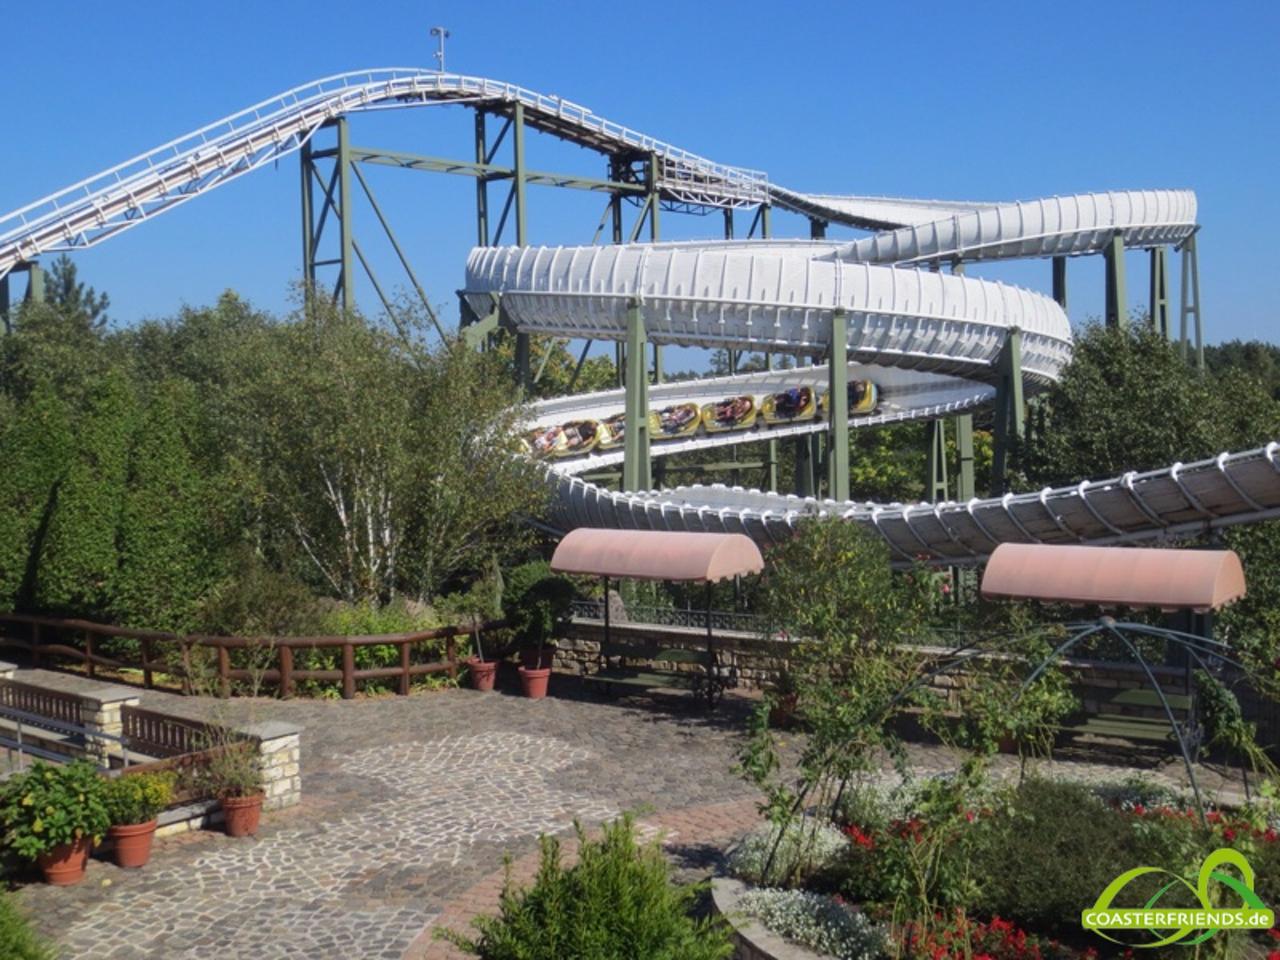 Europa - https://coasterfriends.de/joomla//images/pcp_parkdetails/europa/o1202_heide_park_resort/content2.jpg